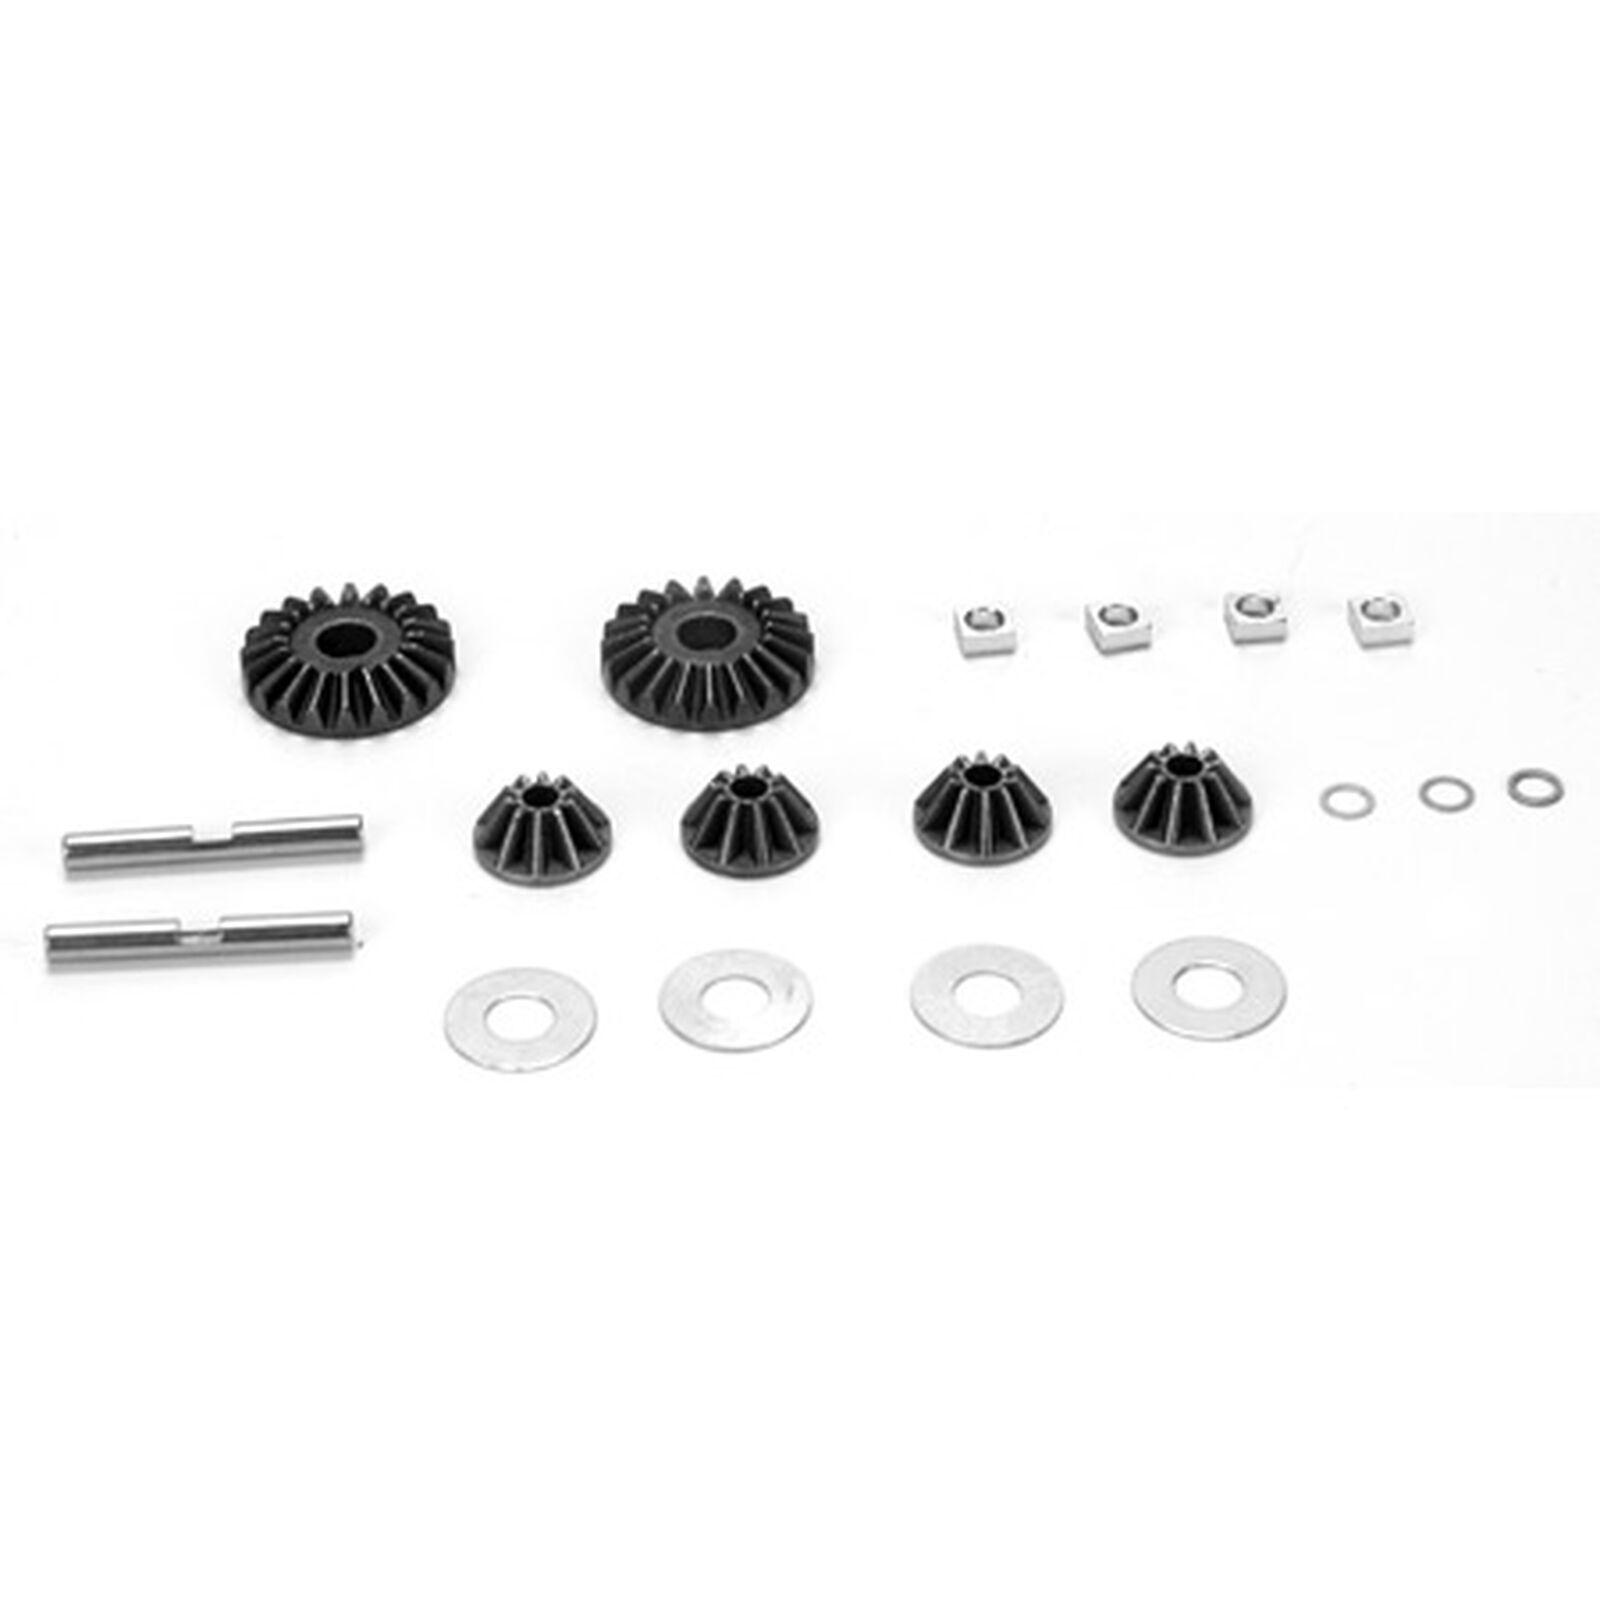 Diff Gear Set w/Hardware: 10-T